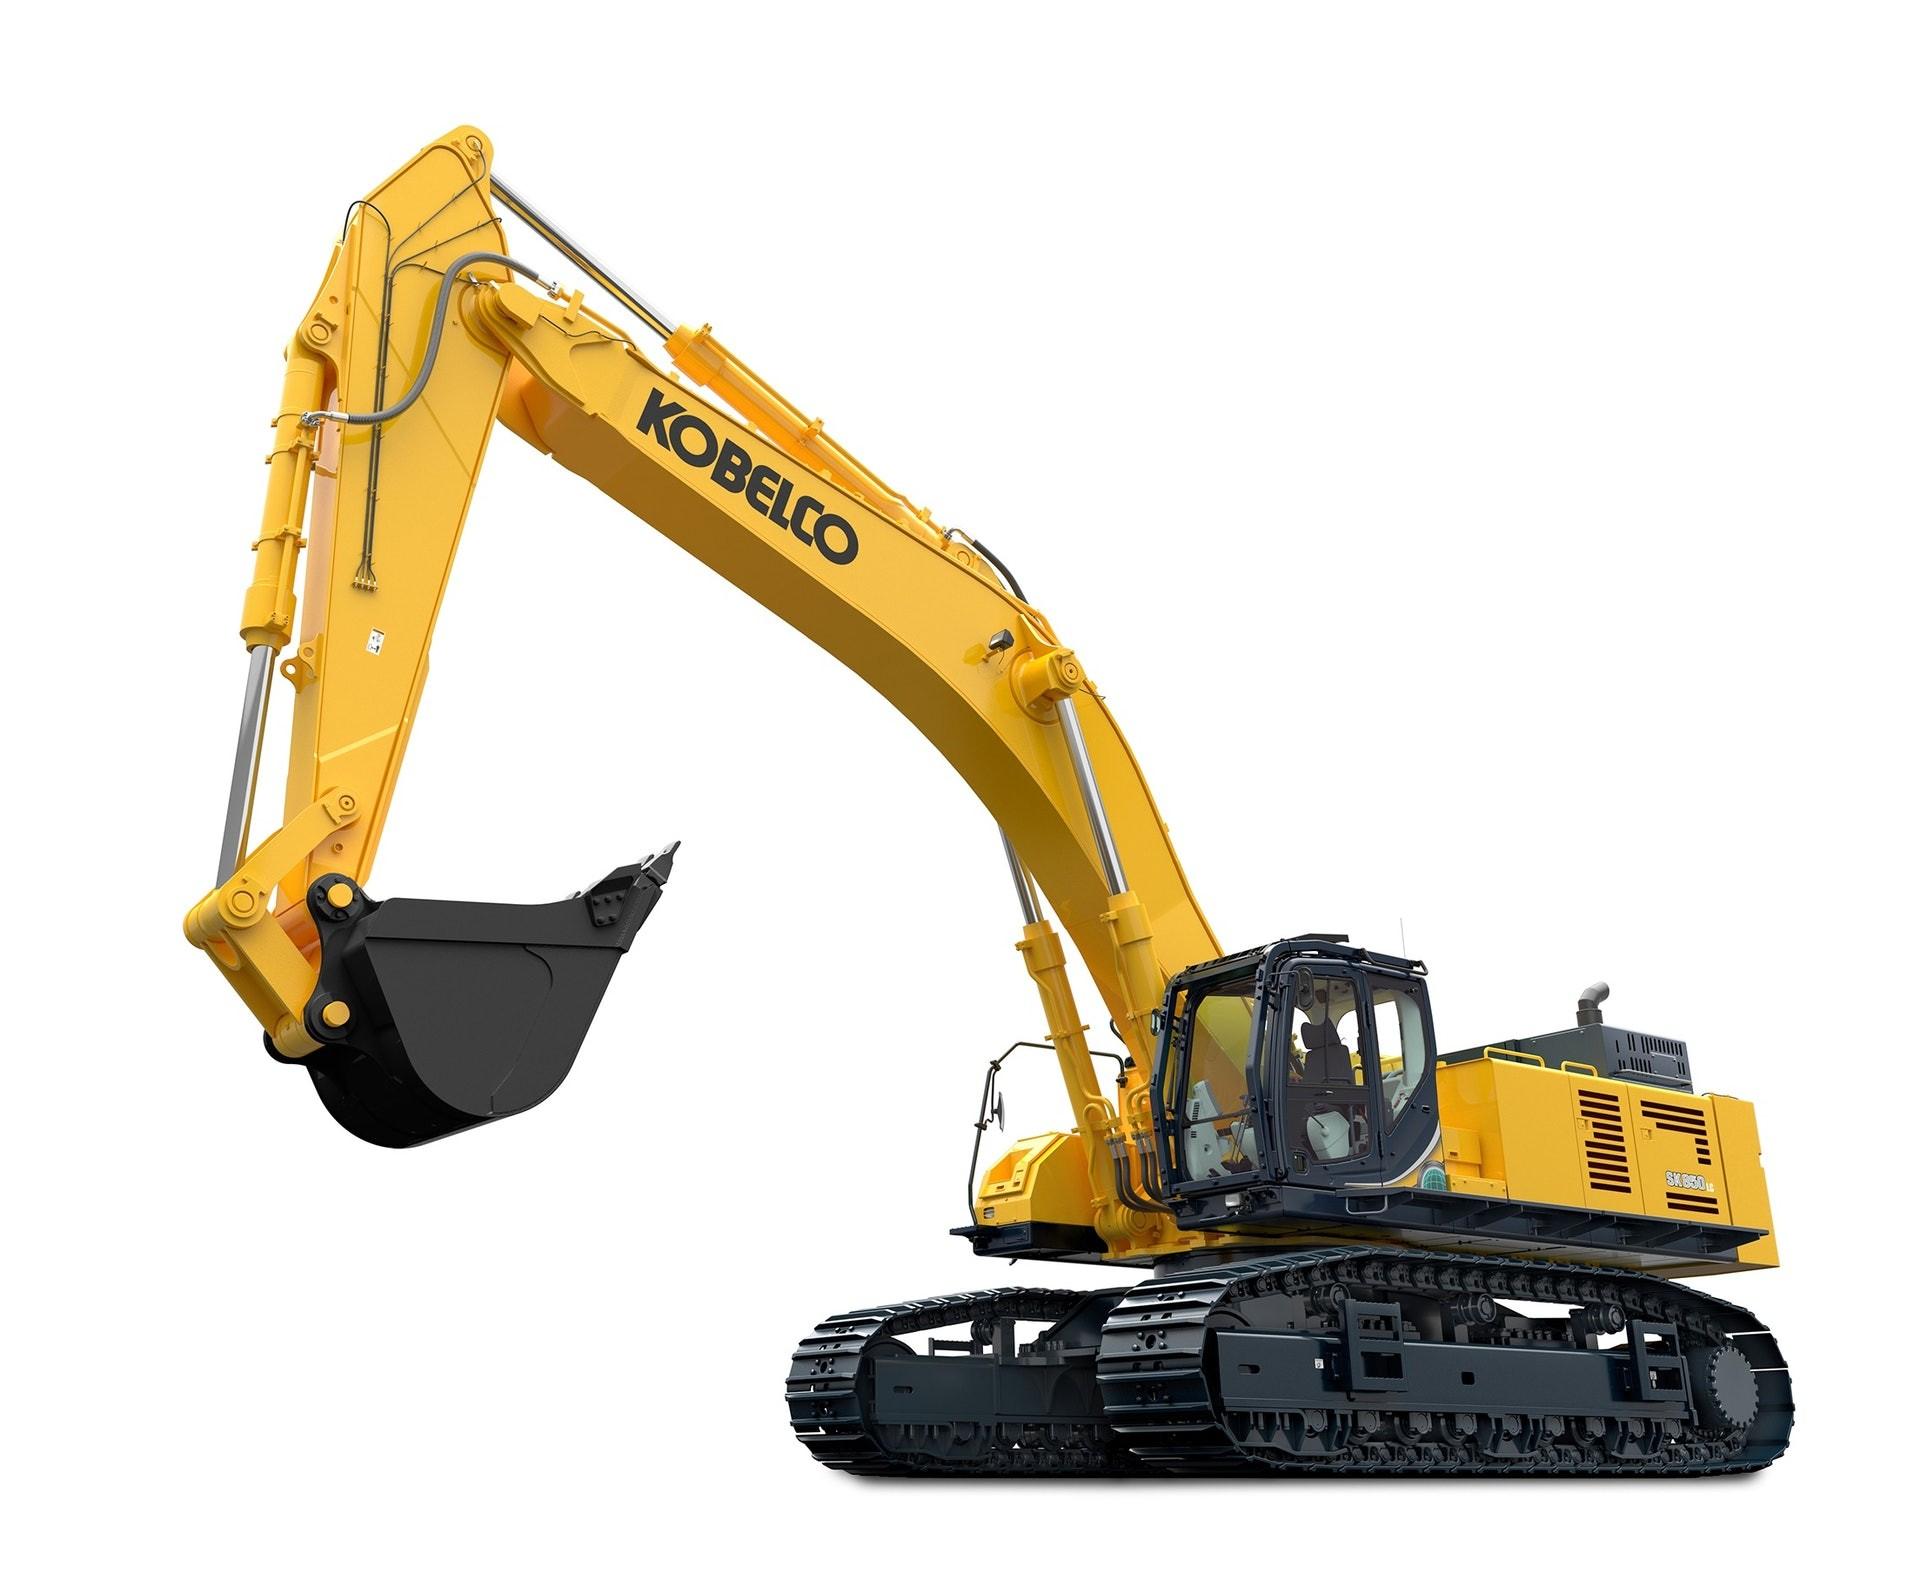 Kobelco torq Convertor Kobelco Sk850lc 10 Excavator From Kobelco Construction Of Kobelco torq Convertor